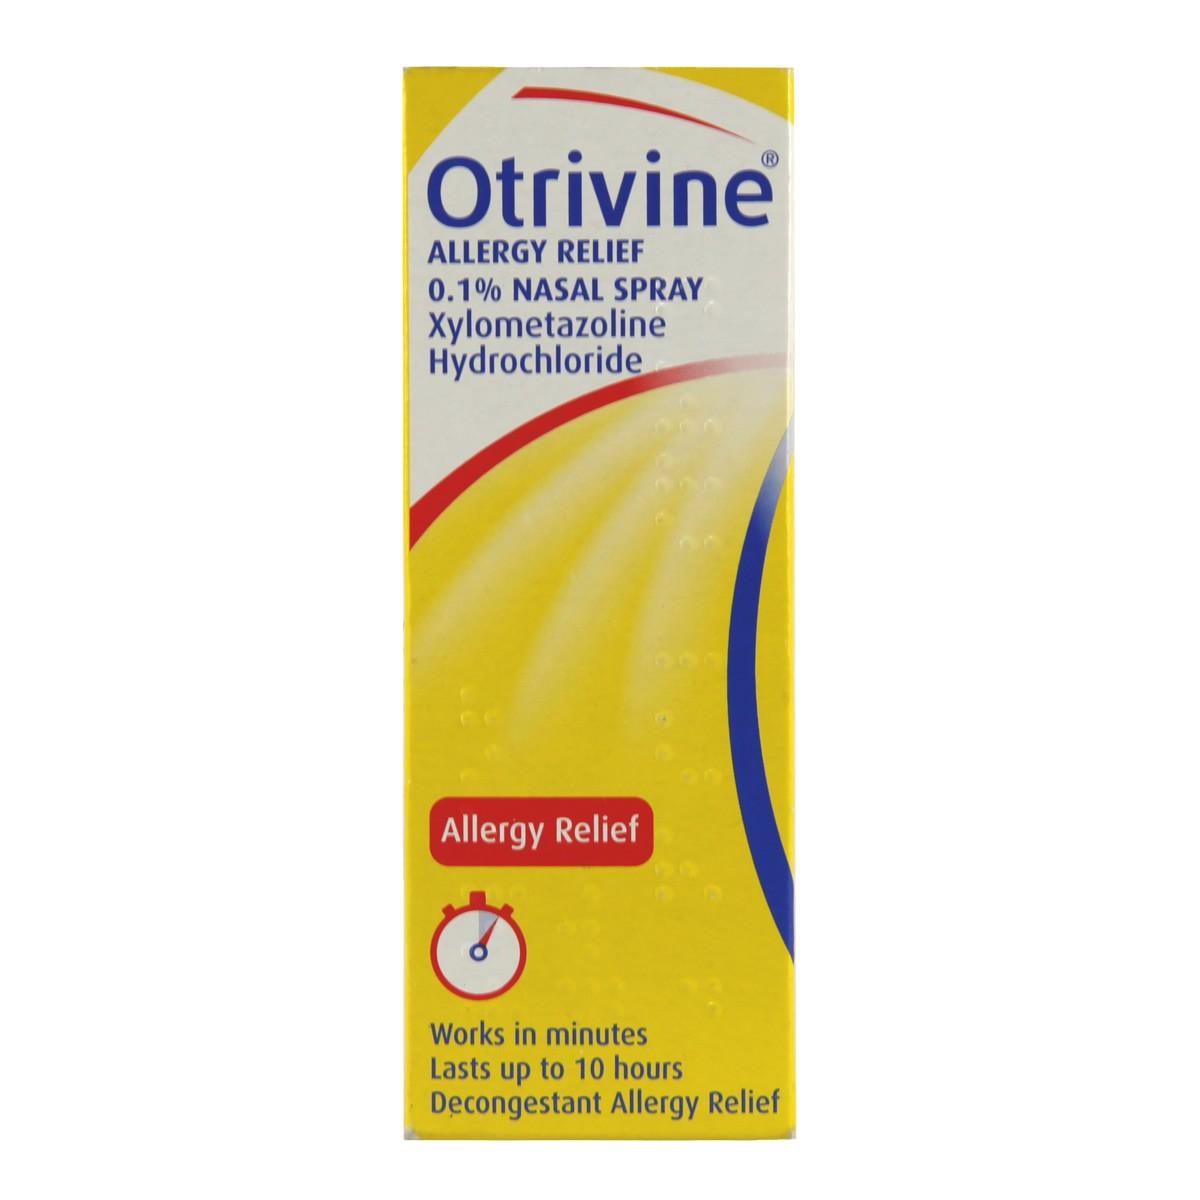 Otrivine Allergy Relief 0.1% Nasal Spray